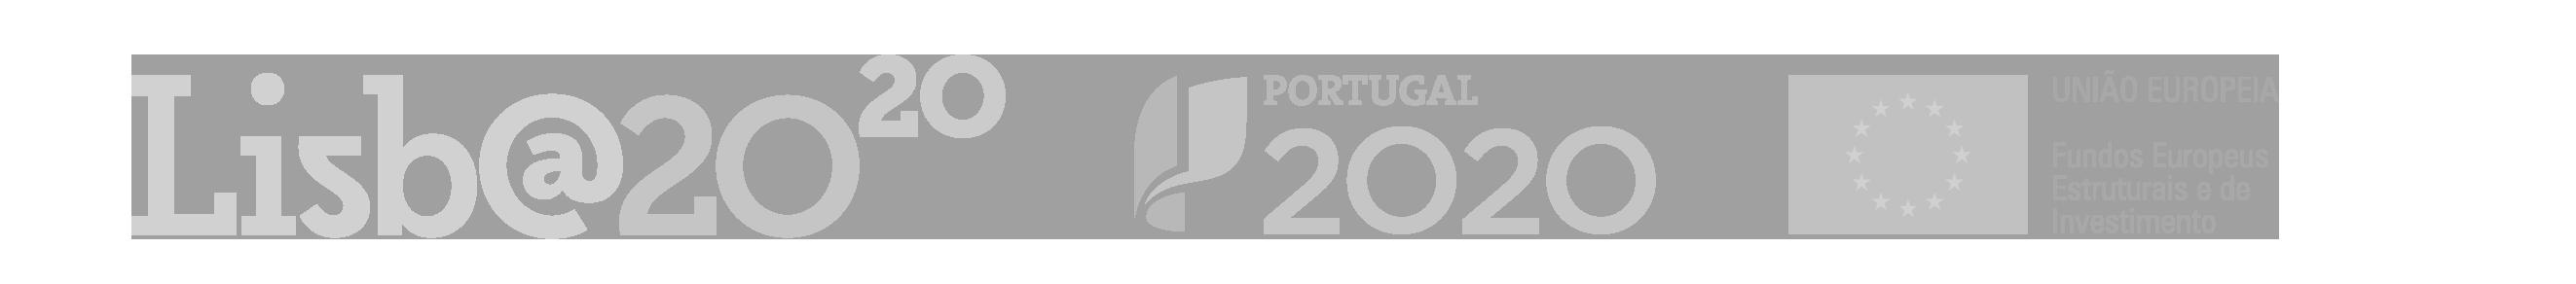 https://adcecija.pt/wp-content/uploads/2020/09/Lisboa2020_RGB_logos.png